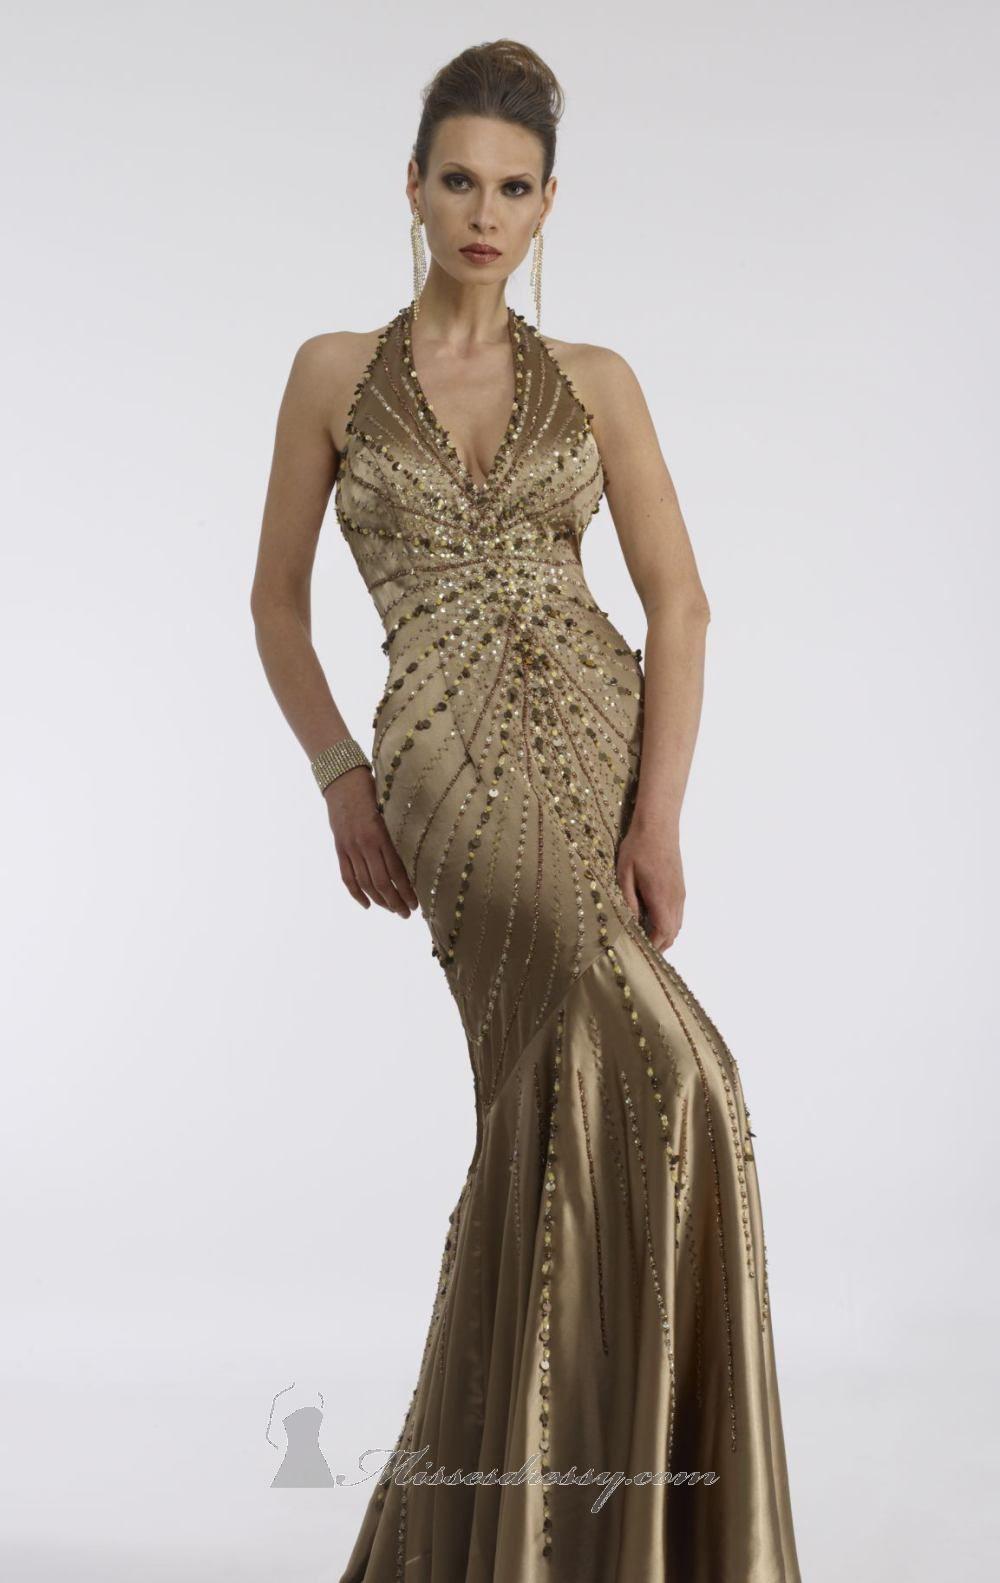 Nika 7017 Dress - Available at www.missesdressy.com